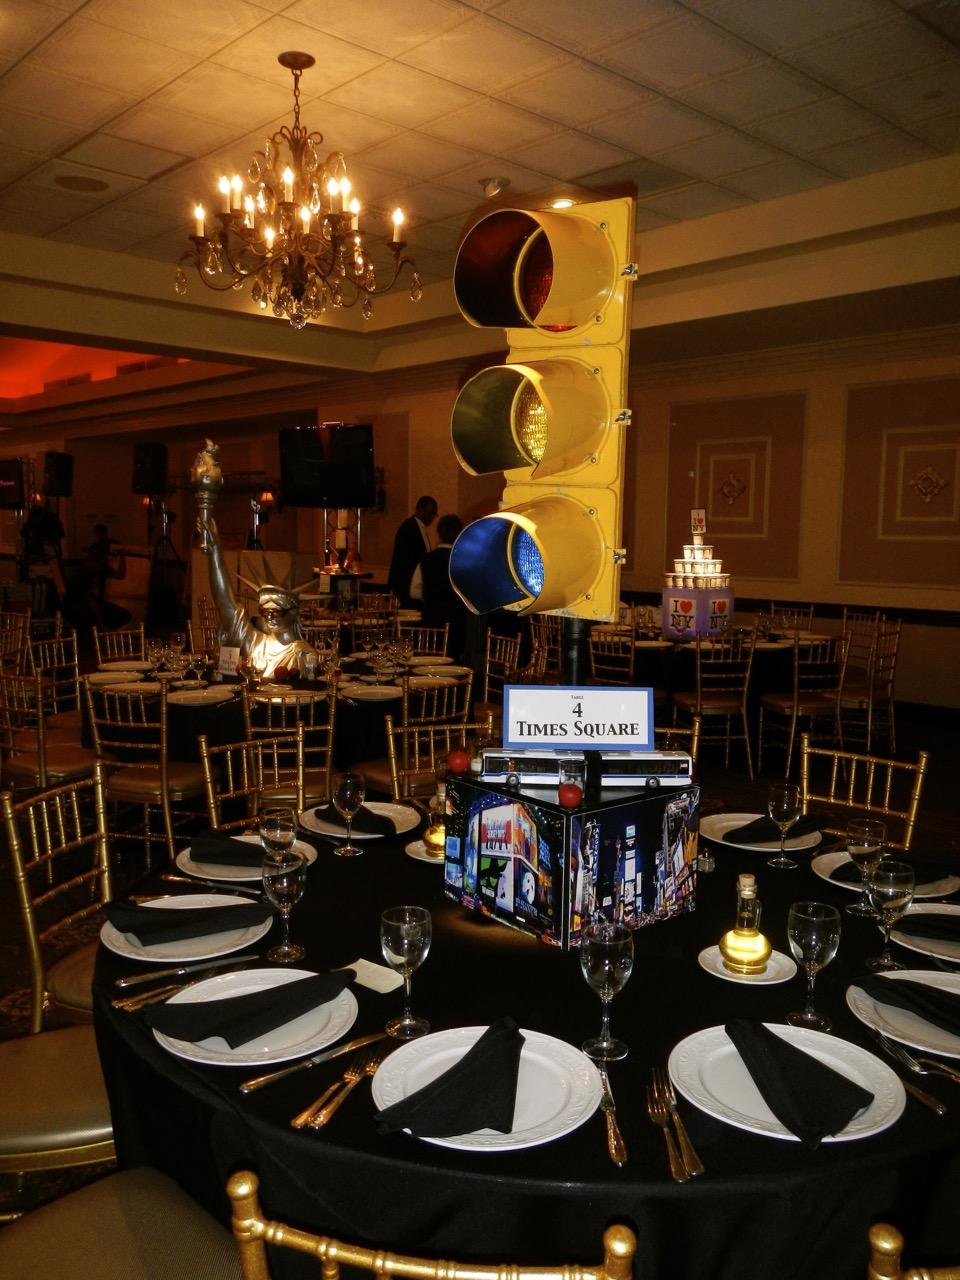 Event+Decor+Design+Lighting+NJ+NYC+Eggsotic+Events+NJs+Best+Event+Decorator+Event+Lighting+Event+Design+Wedding+Bar+Mitzvah+Bat+Mitzvah+Gala+Fundraiser+Social+Corporate+08.jpg